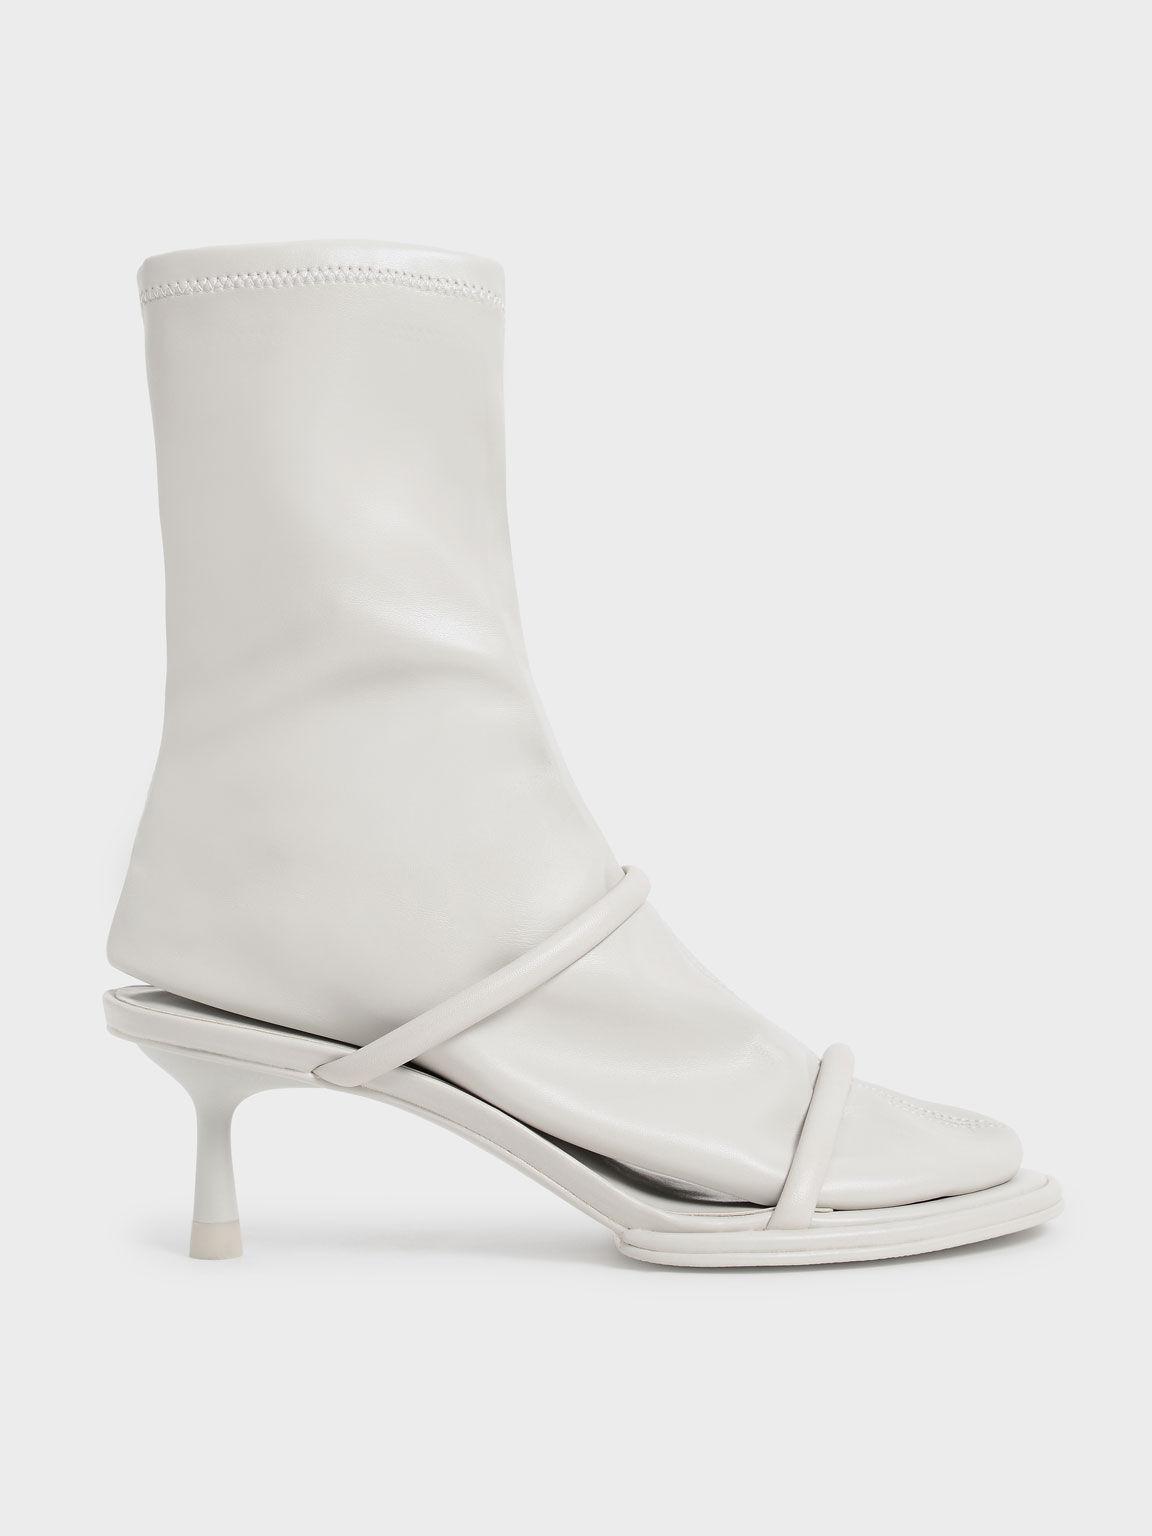 Lucile Stiletto Calf Boots, Grey, hi-res